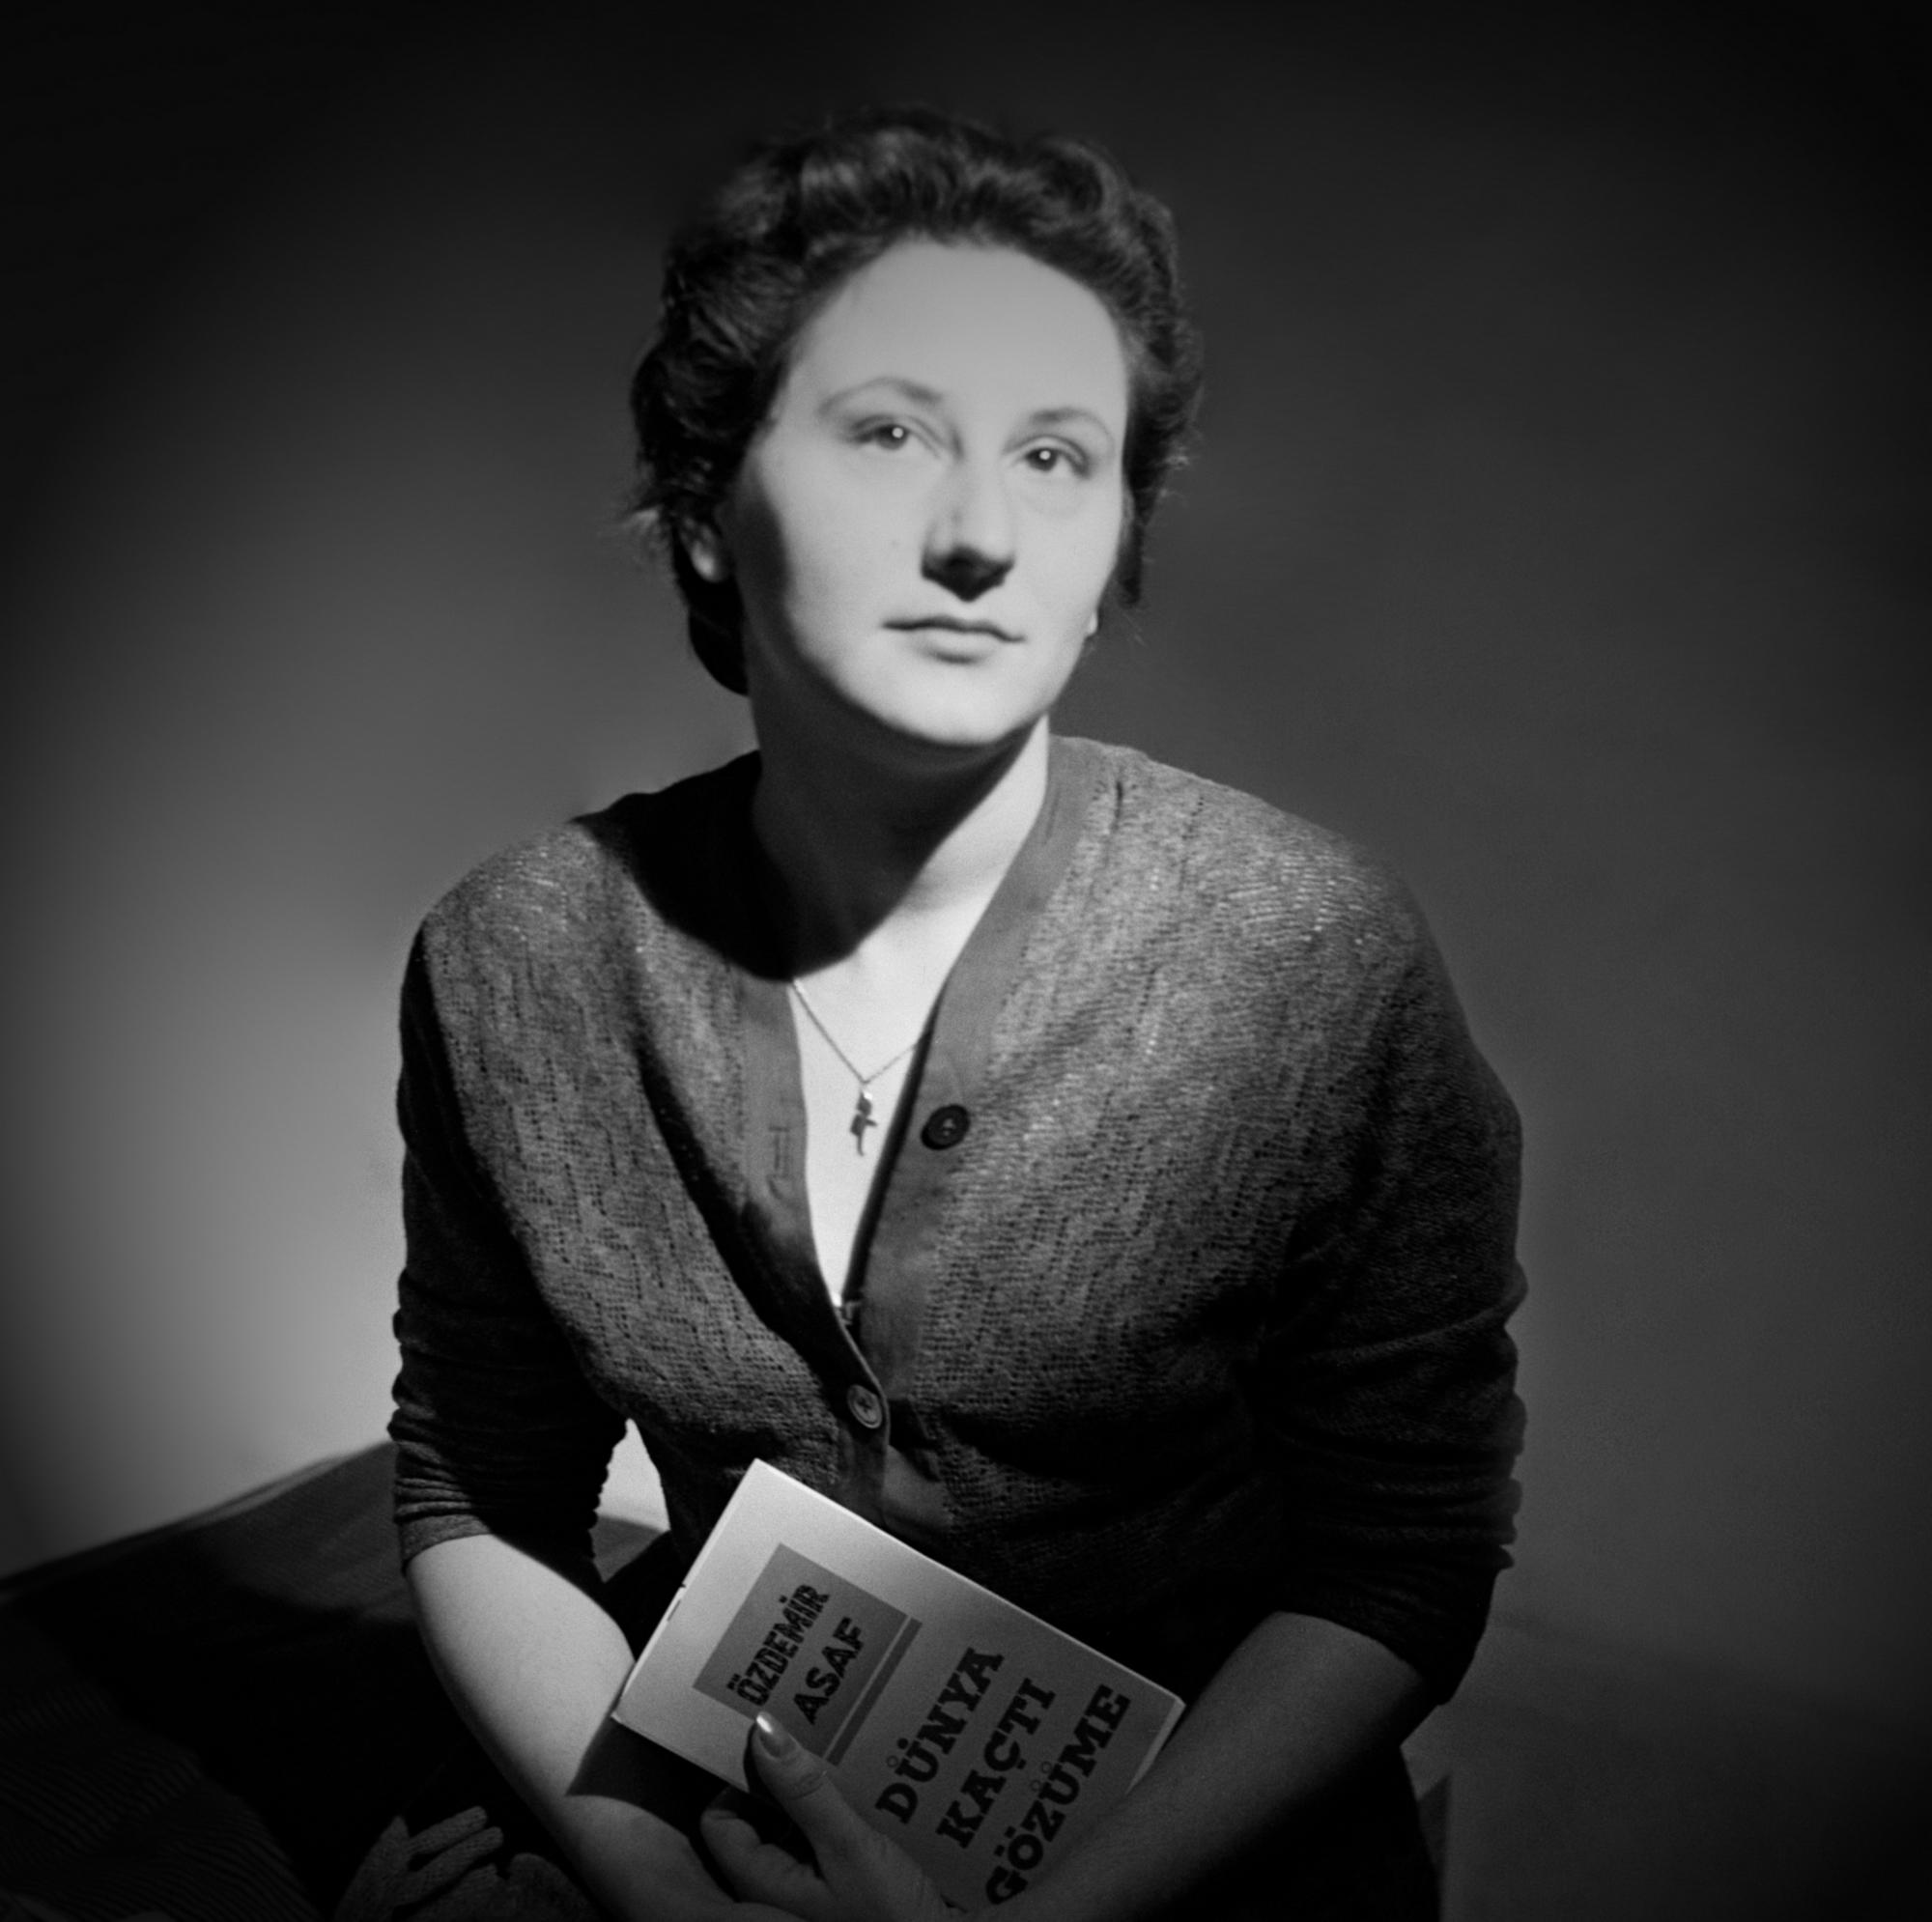 GULEN MORAN, 1955